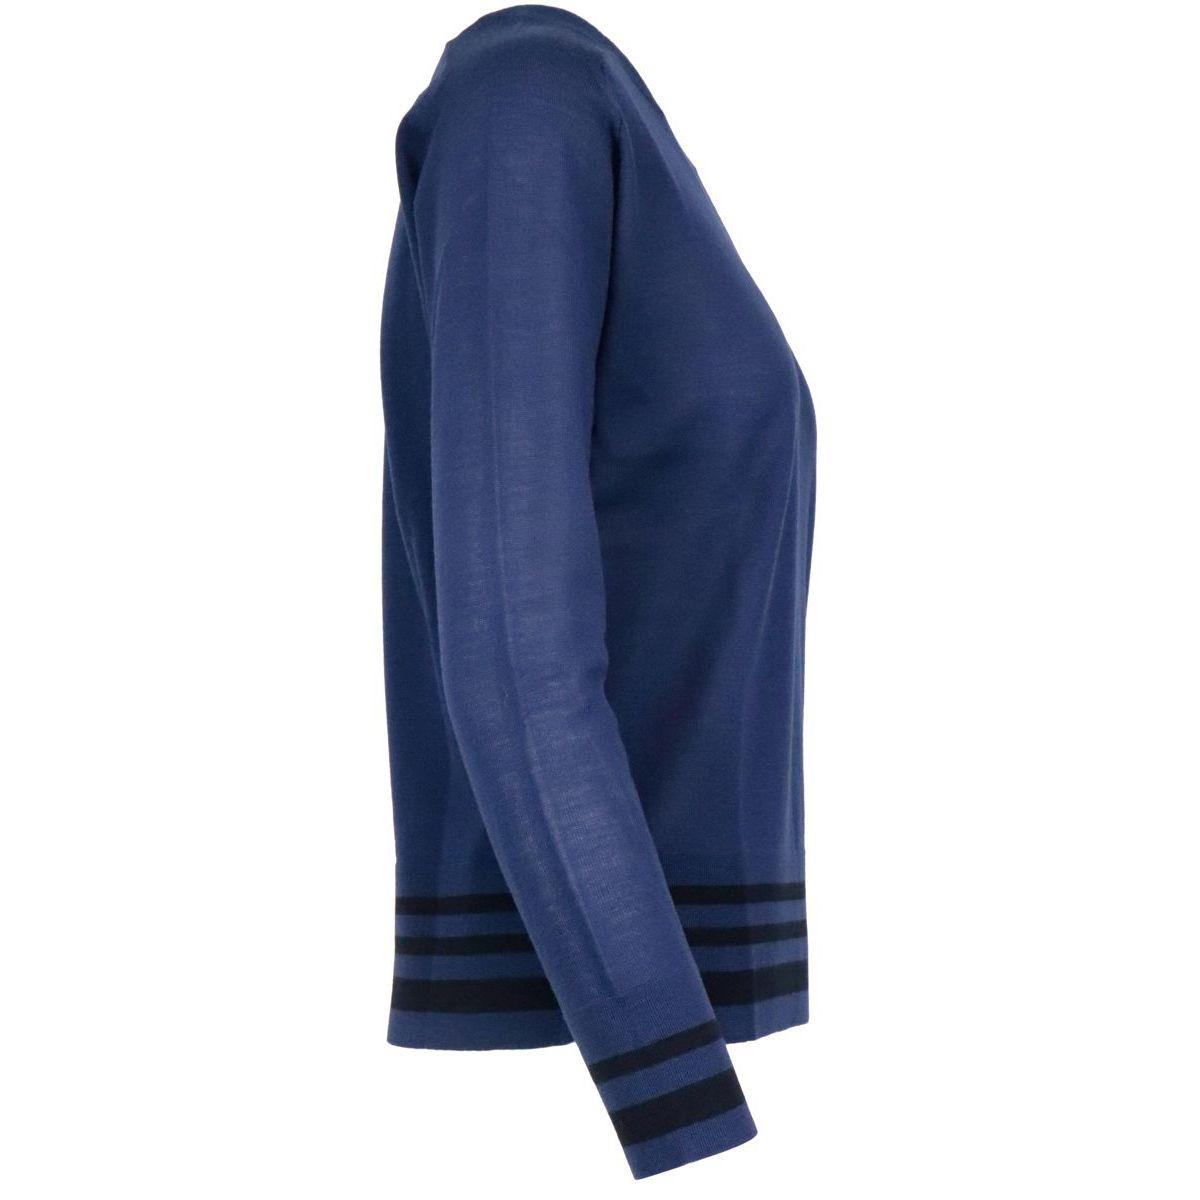 Dolly crewneck sweater in pure wool Ink MAX MARA STUDIO